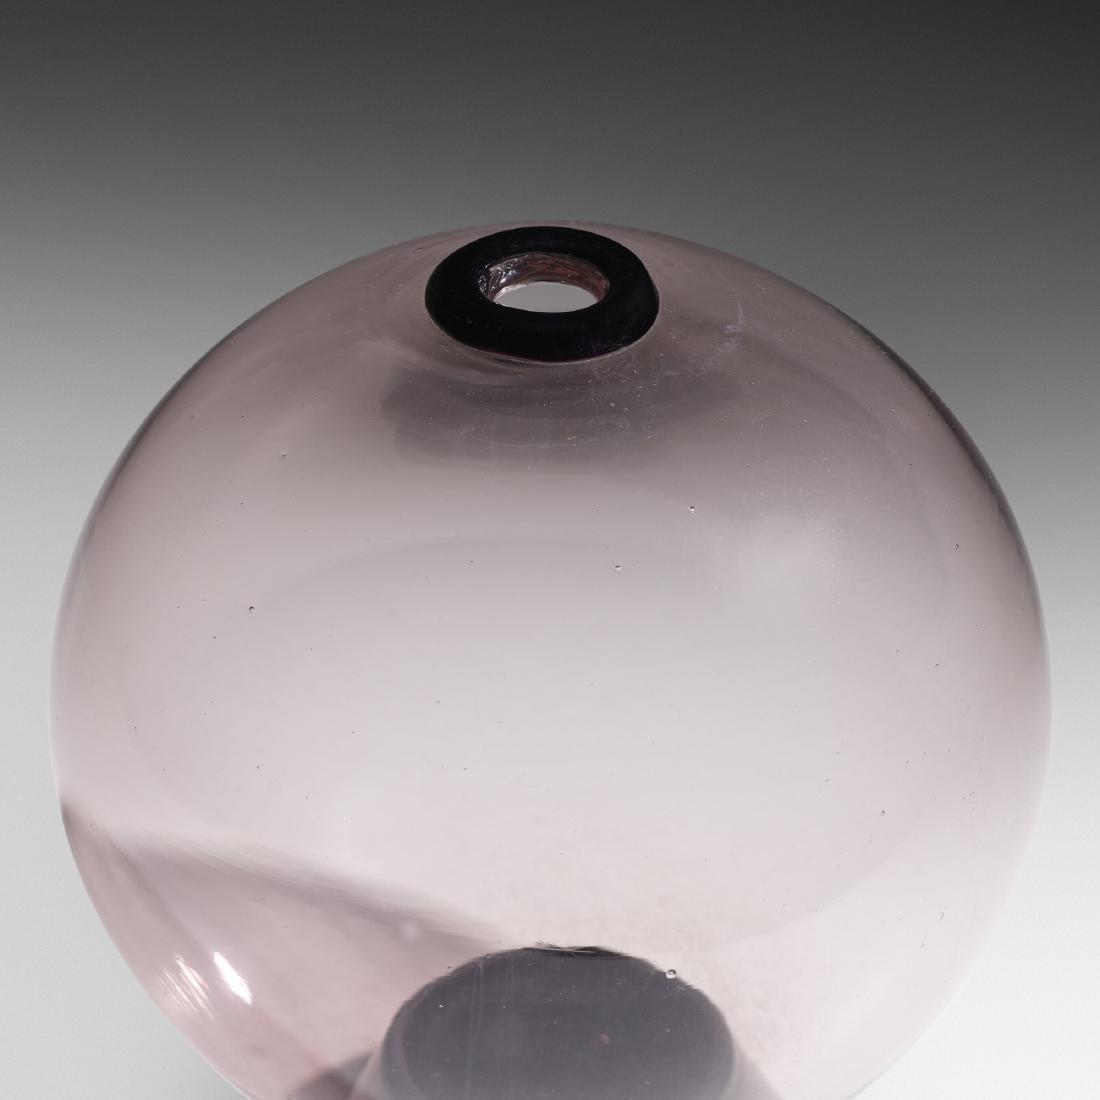 Carlo Scarpa, Transparenti vase, model 5673 - 2